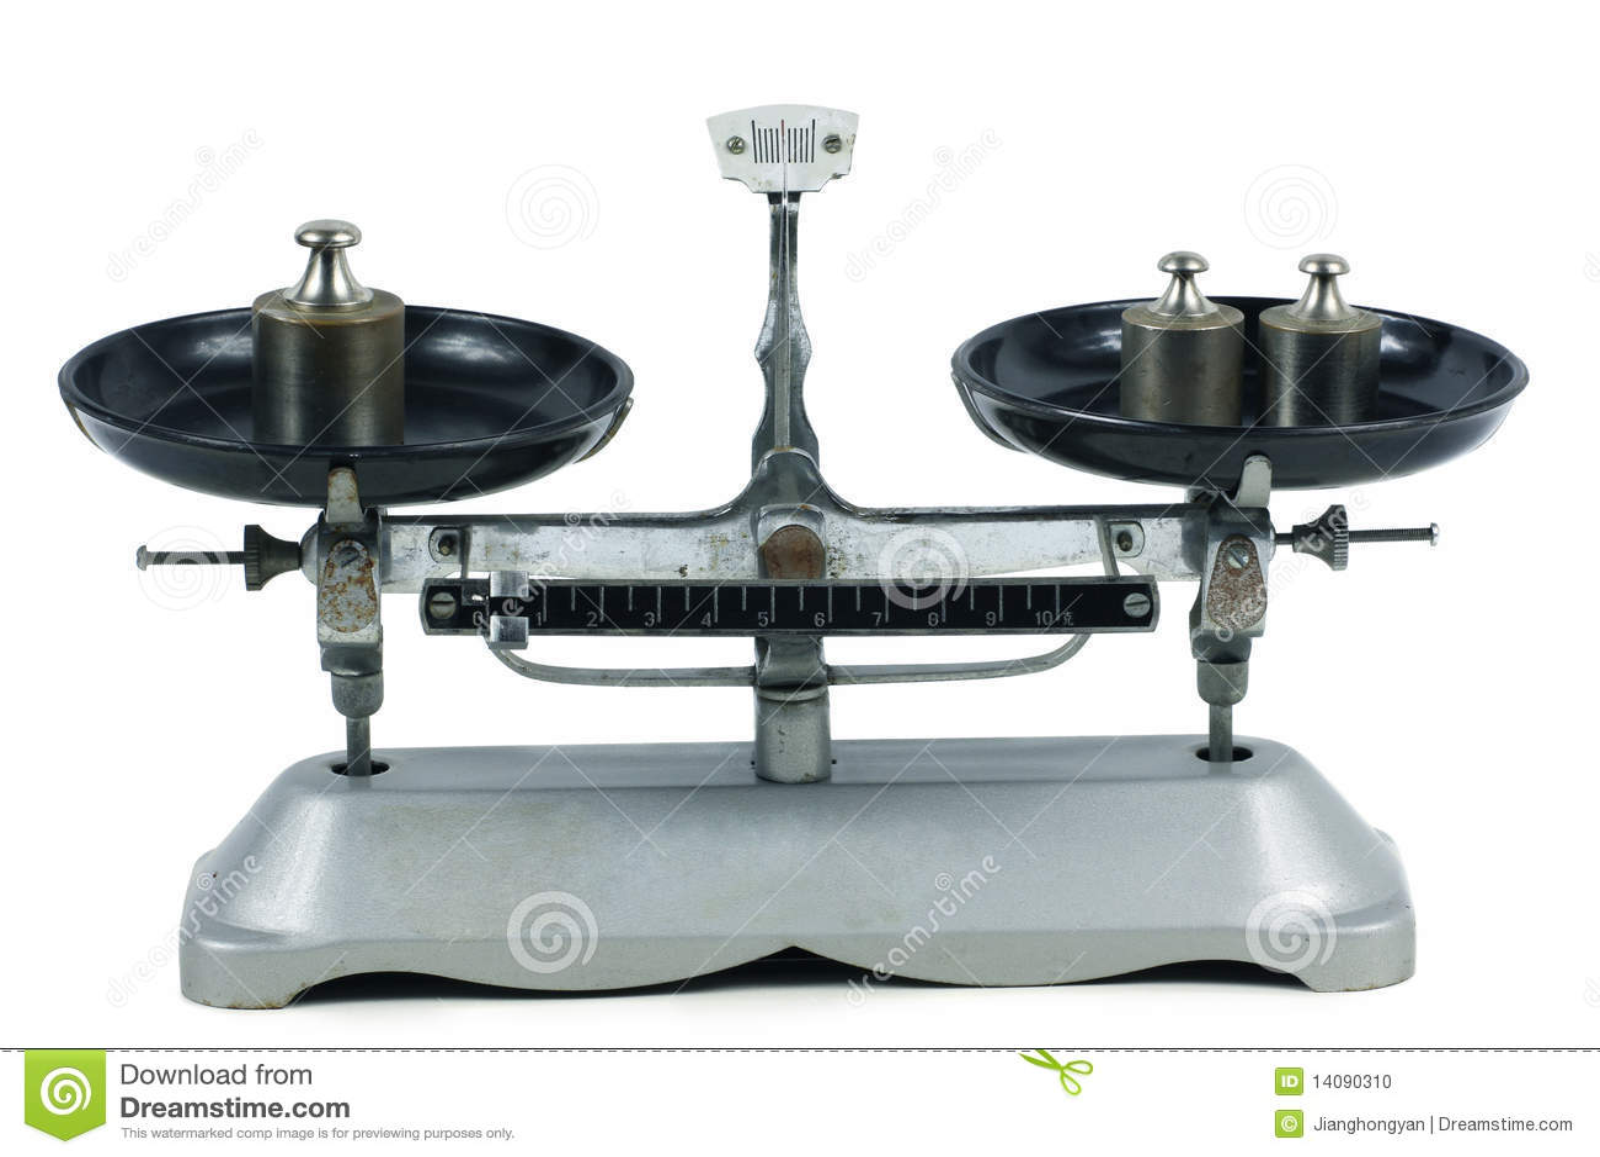 Tray Balance & Weight Stock Photo - Image: 14090310